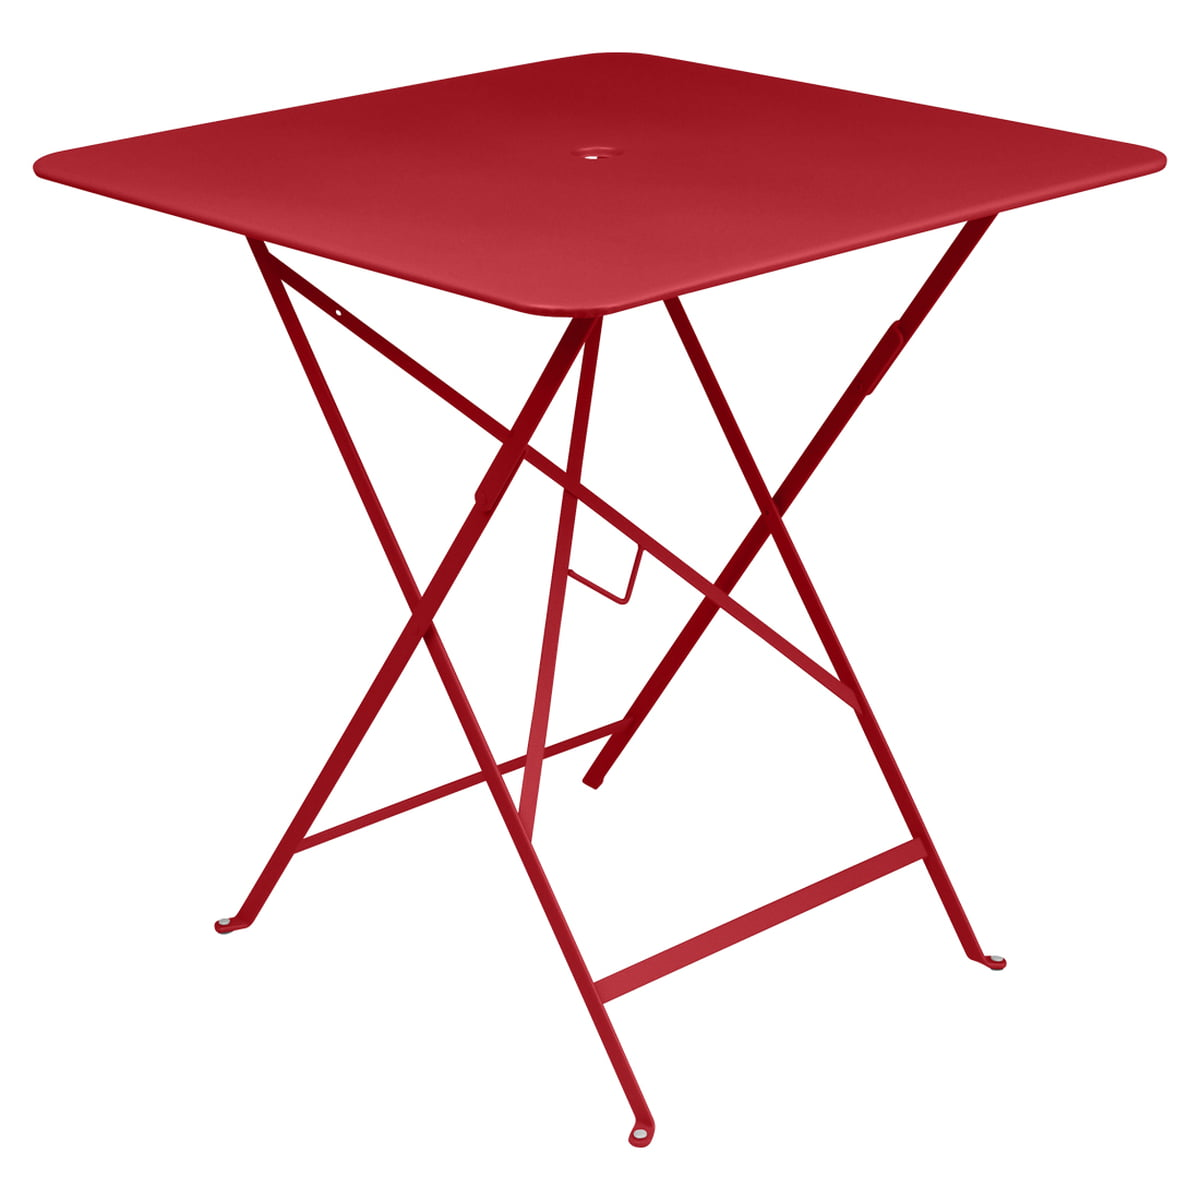 Fermob - table pliante Bistro, 71 x 71, rouge pavot